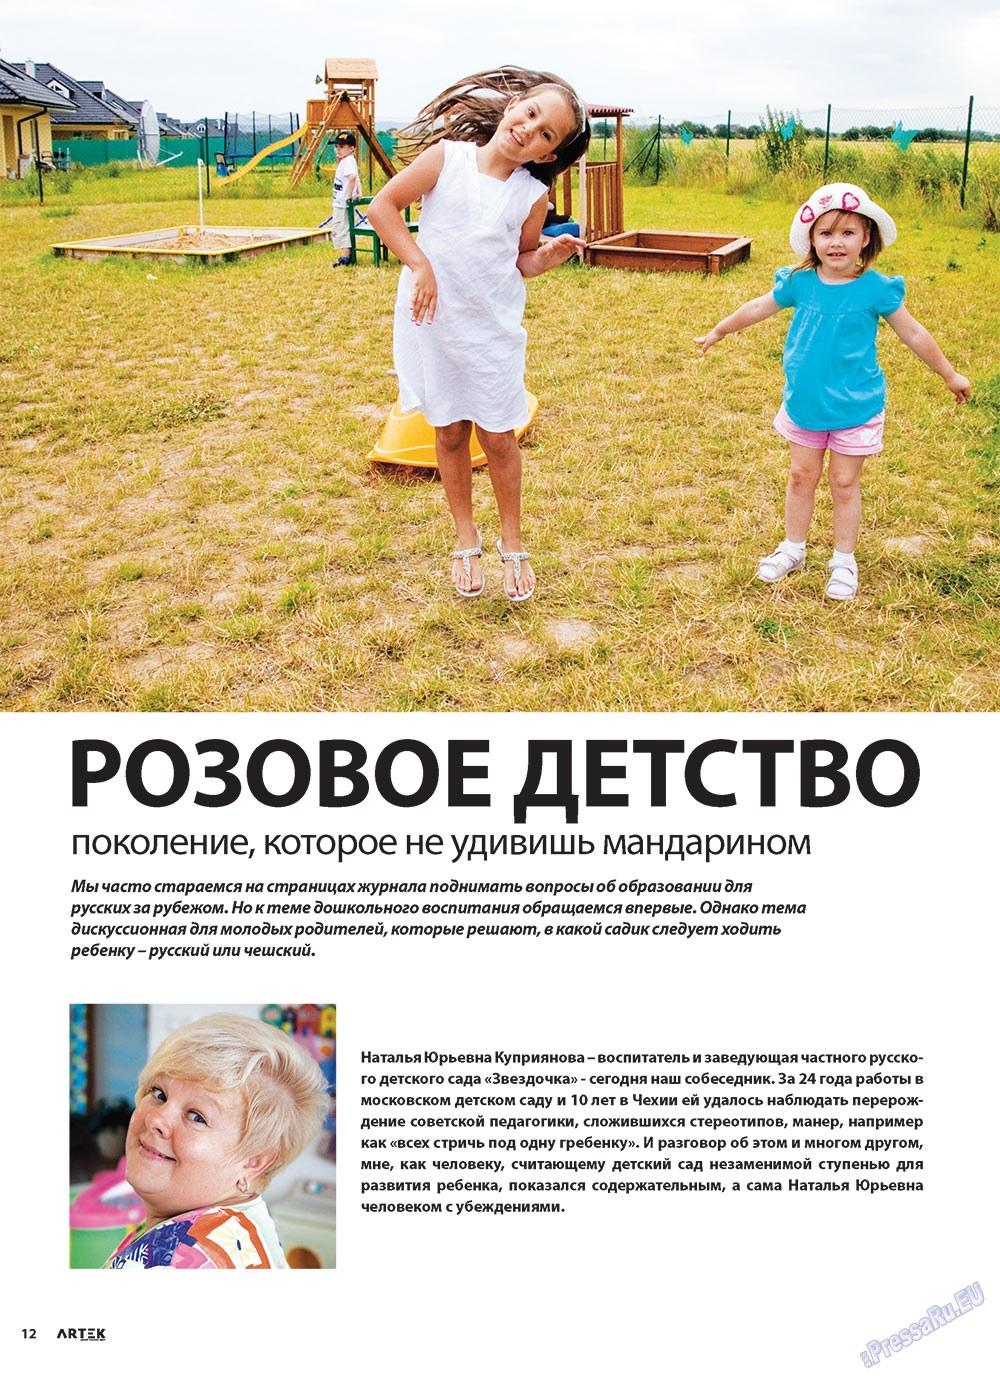 Артек (журнал). 2010 год, номер 4, стр. 14